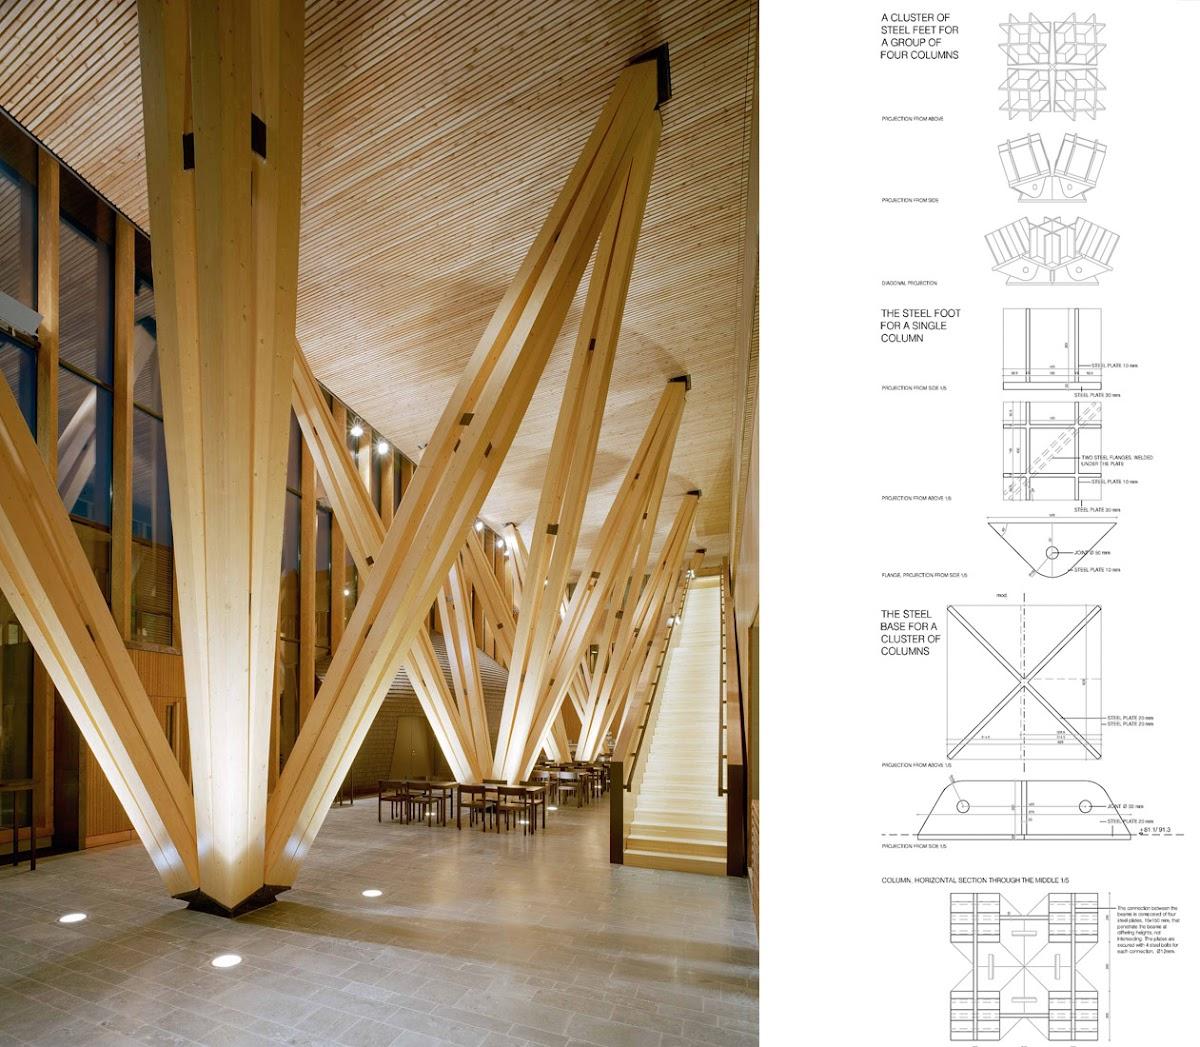 Una caja de madera finlandesa para la investigaci n - Estructura de madera laminada ...